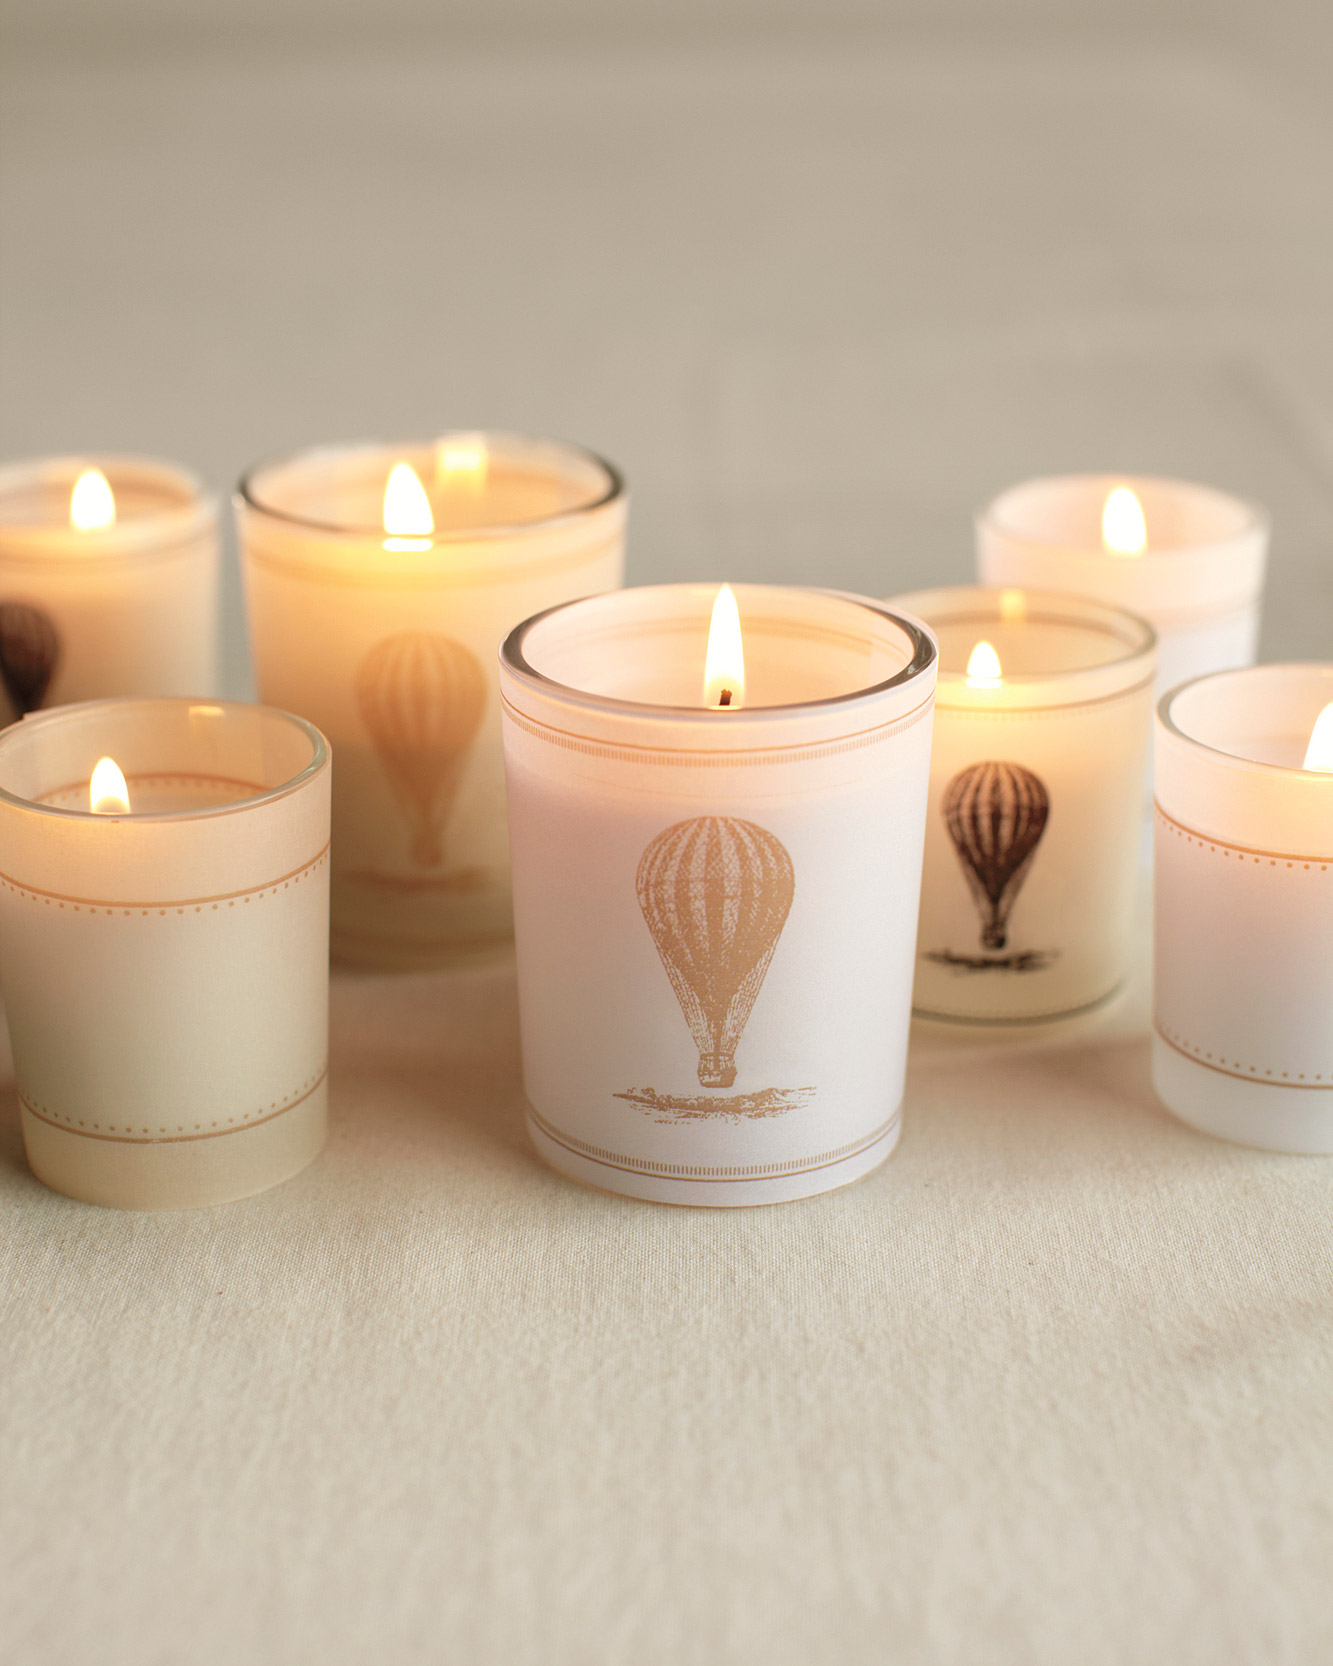 clip-art-candles-mwd107615.jpg